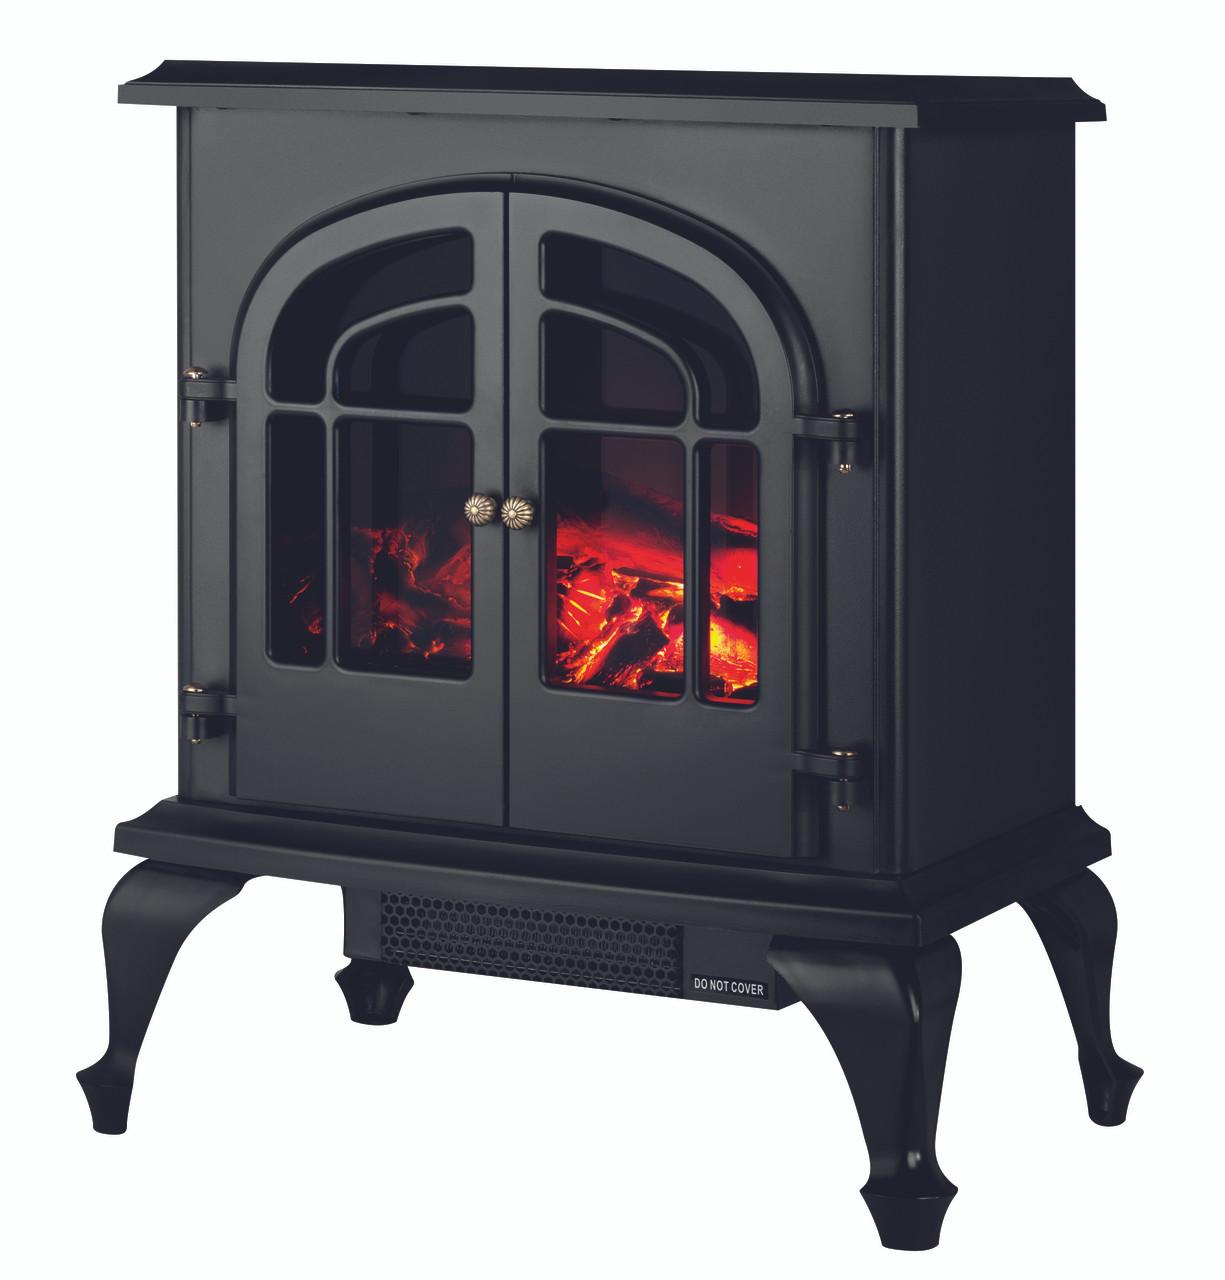 Warmlite WL46001